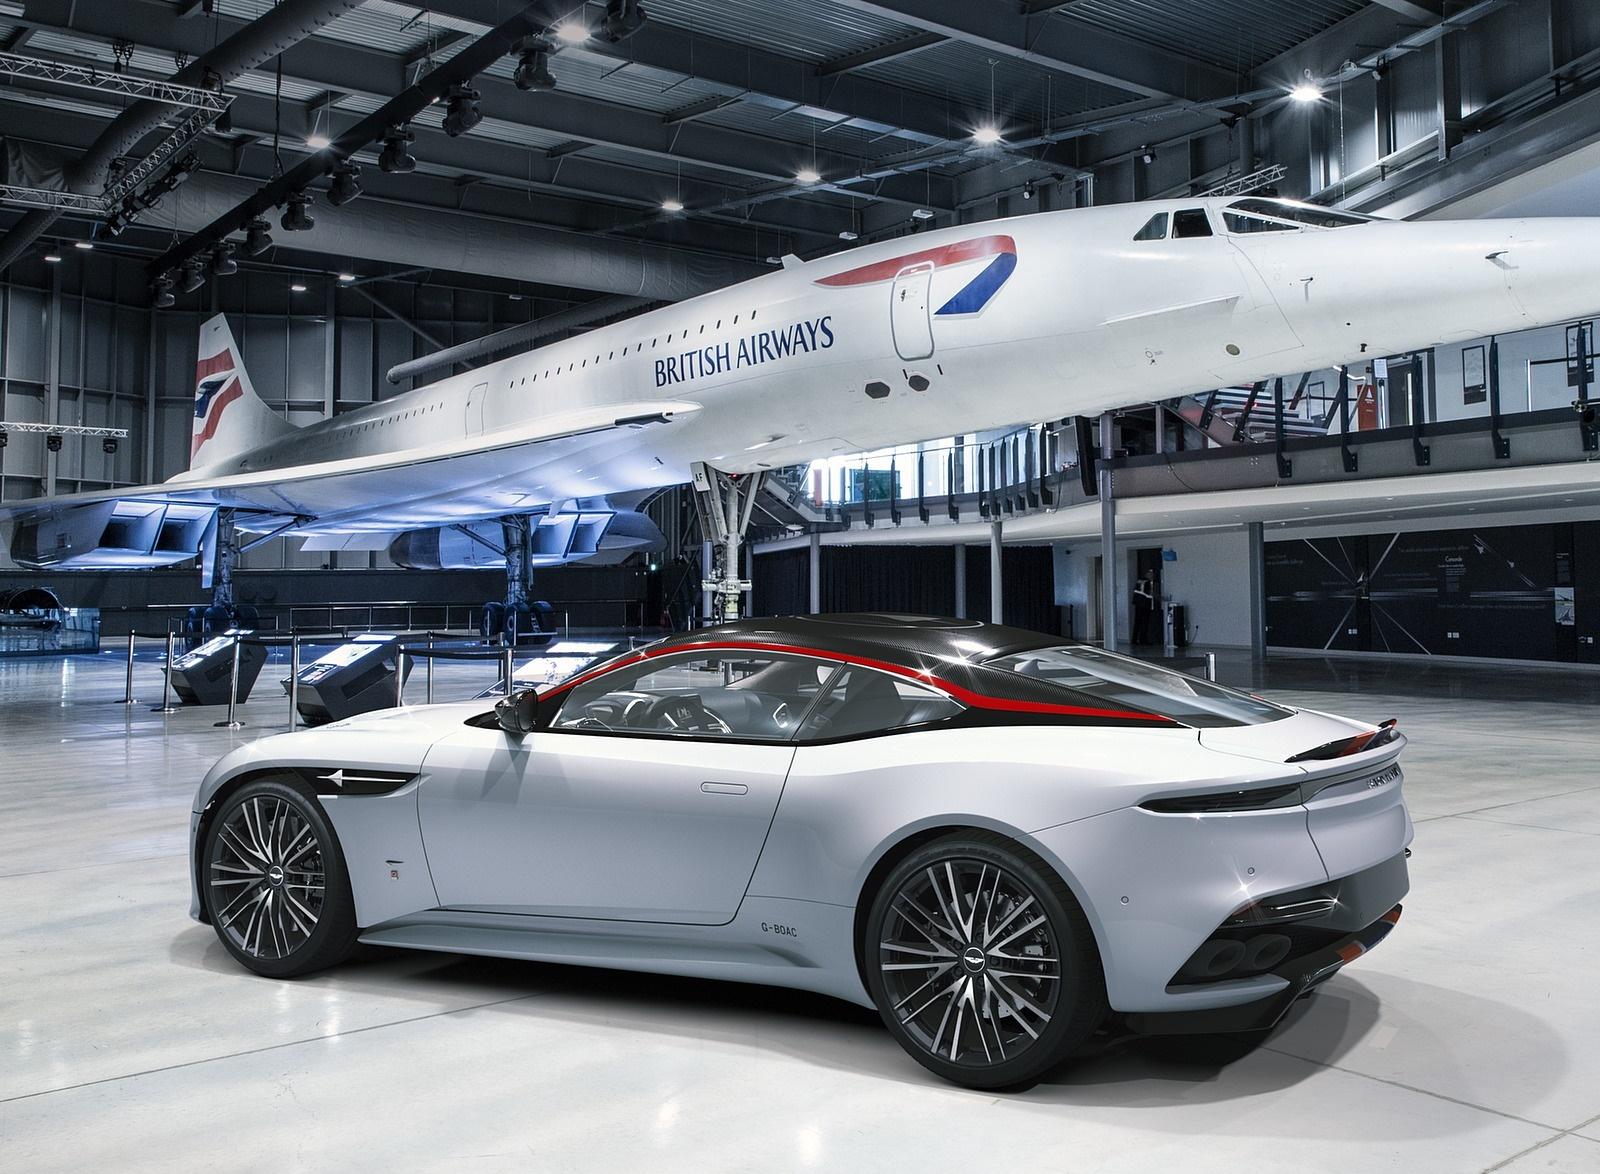 2019 Aston Martin DBS Superleggera Concorde Edition Rear Three-Quarter Wallpapers (2)